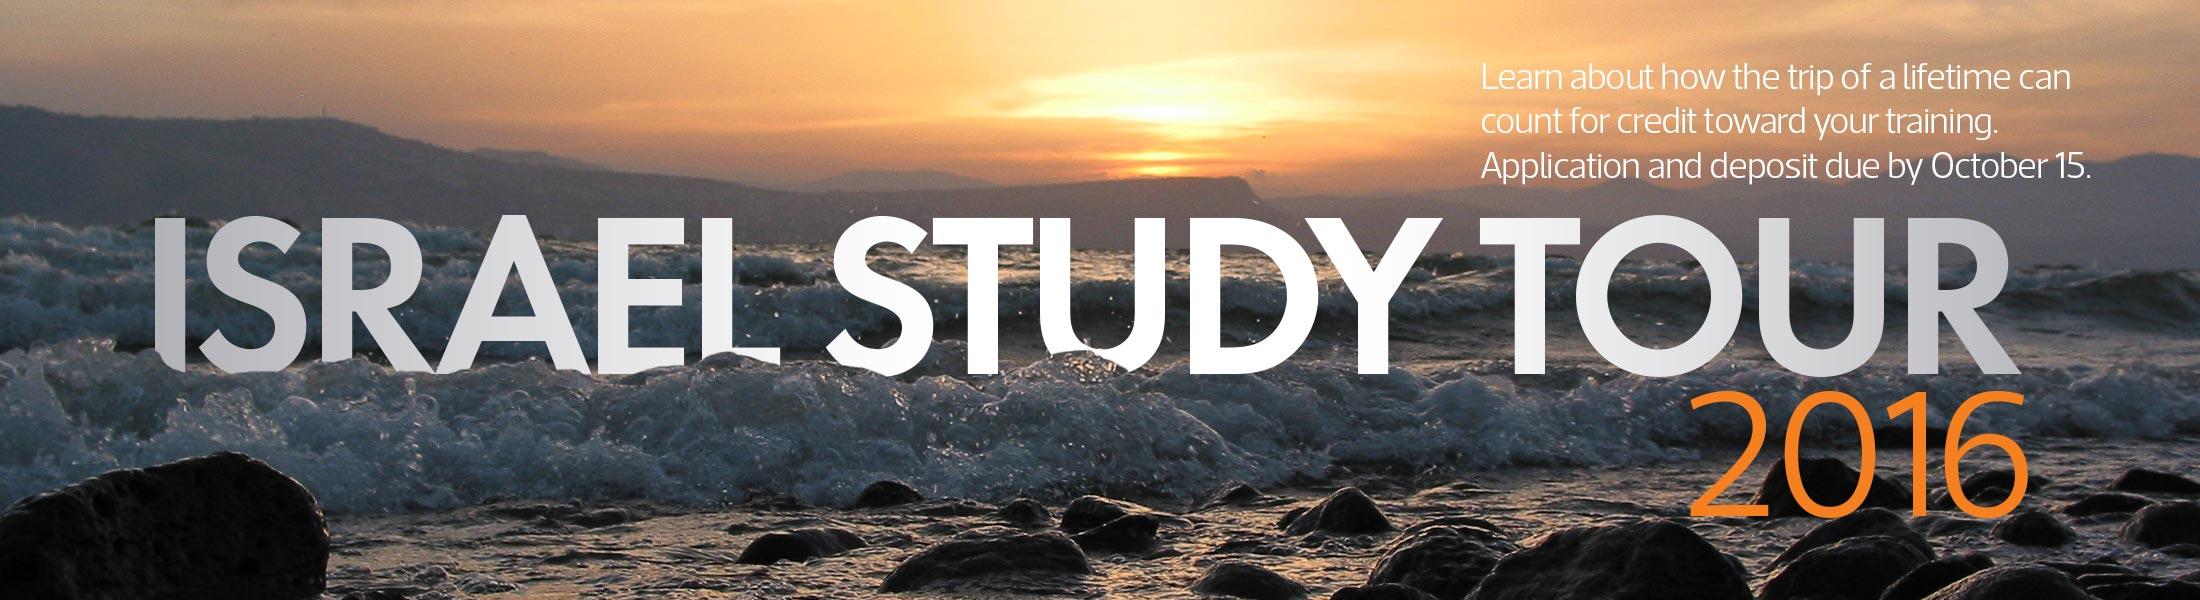 Israel Study Tour 2016